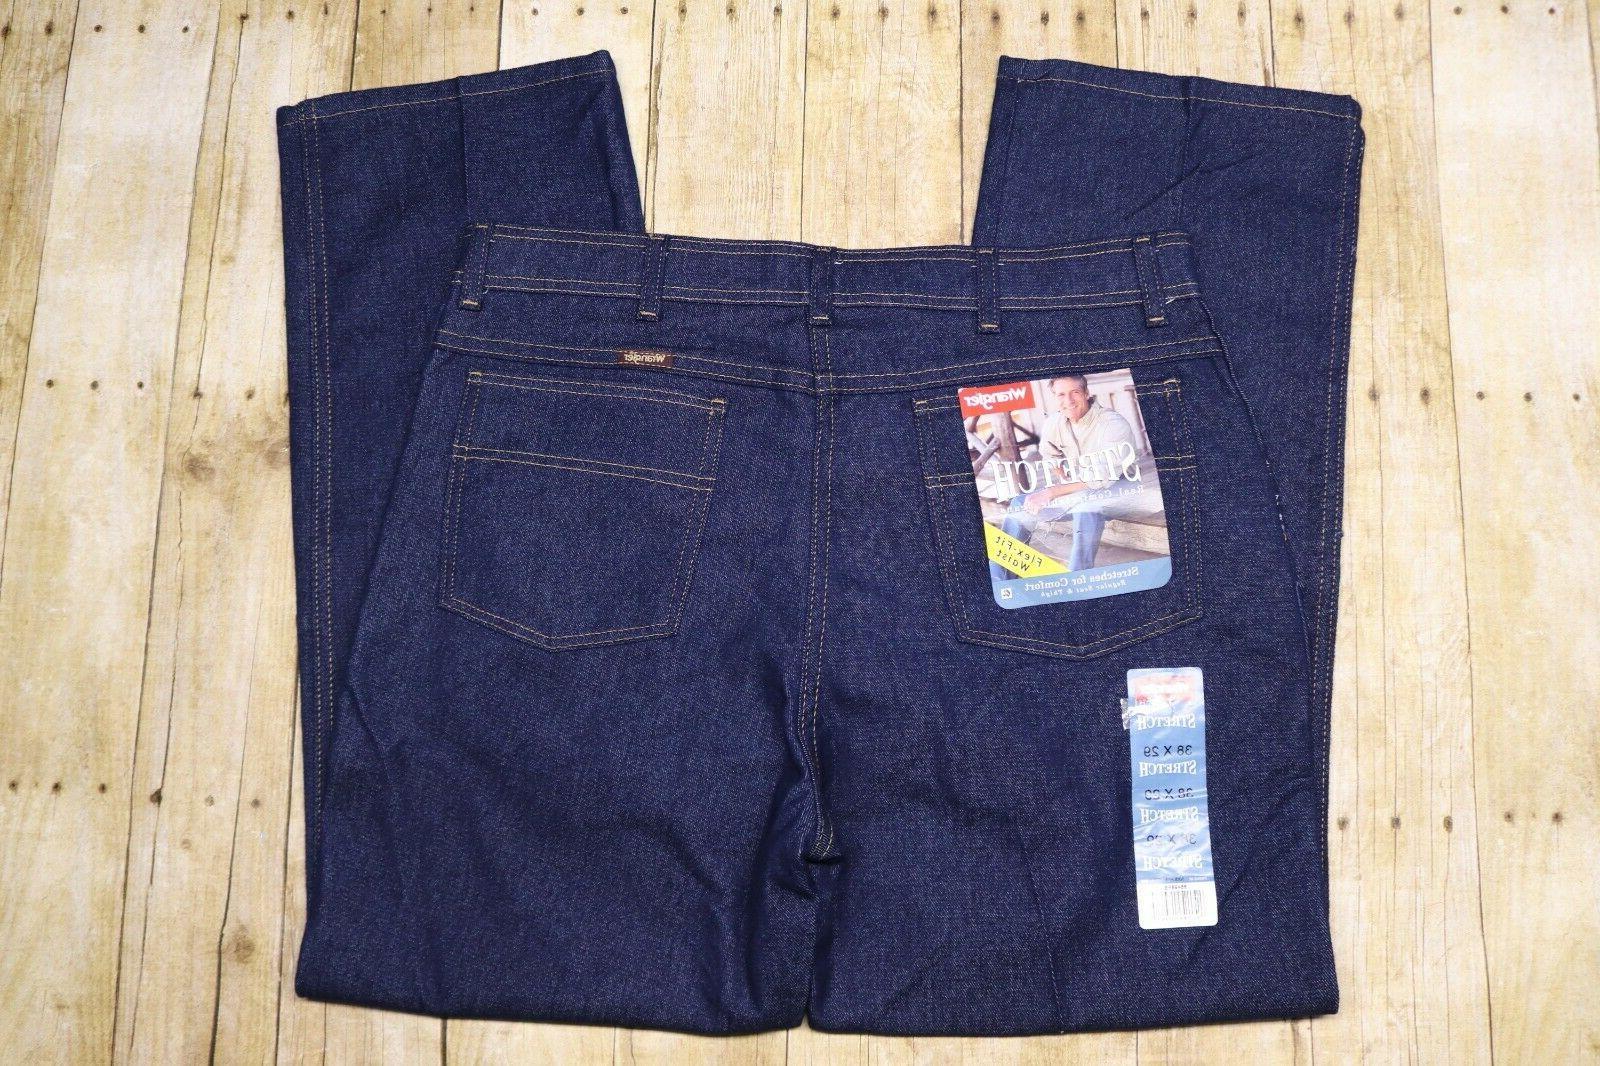 NWT men's star fit jeans 36x30